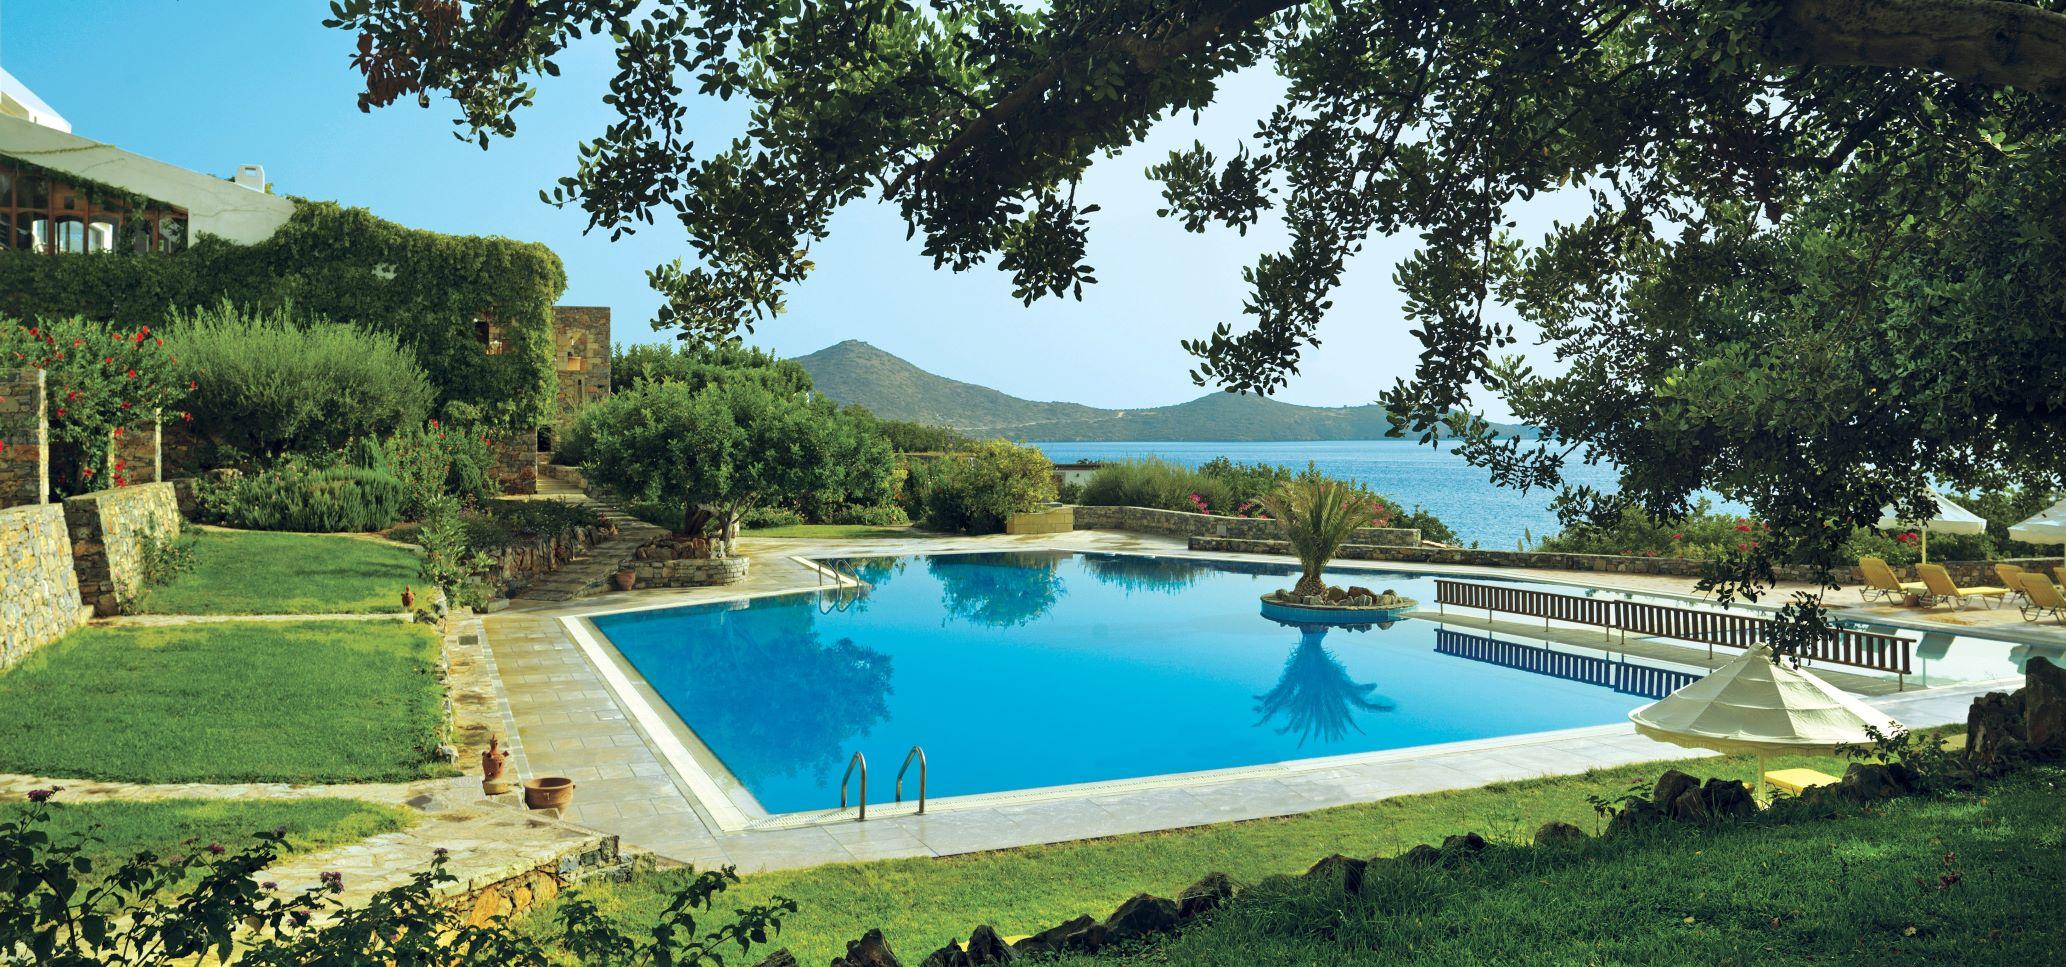 elounda-mare-crete-main-pool